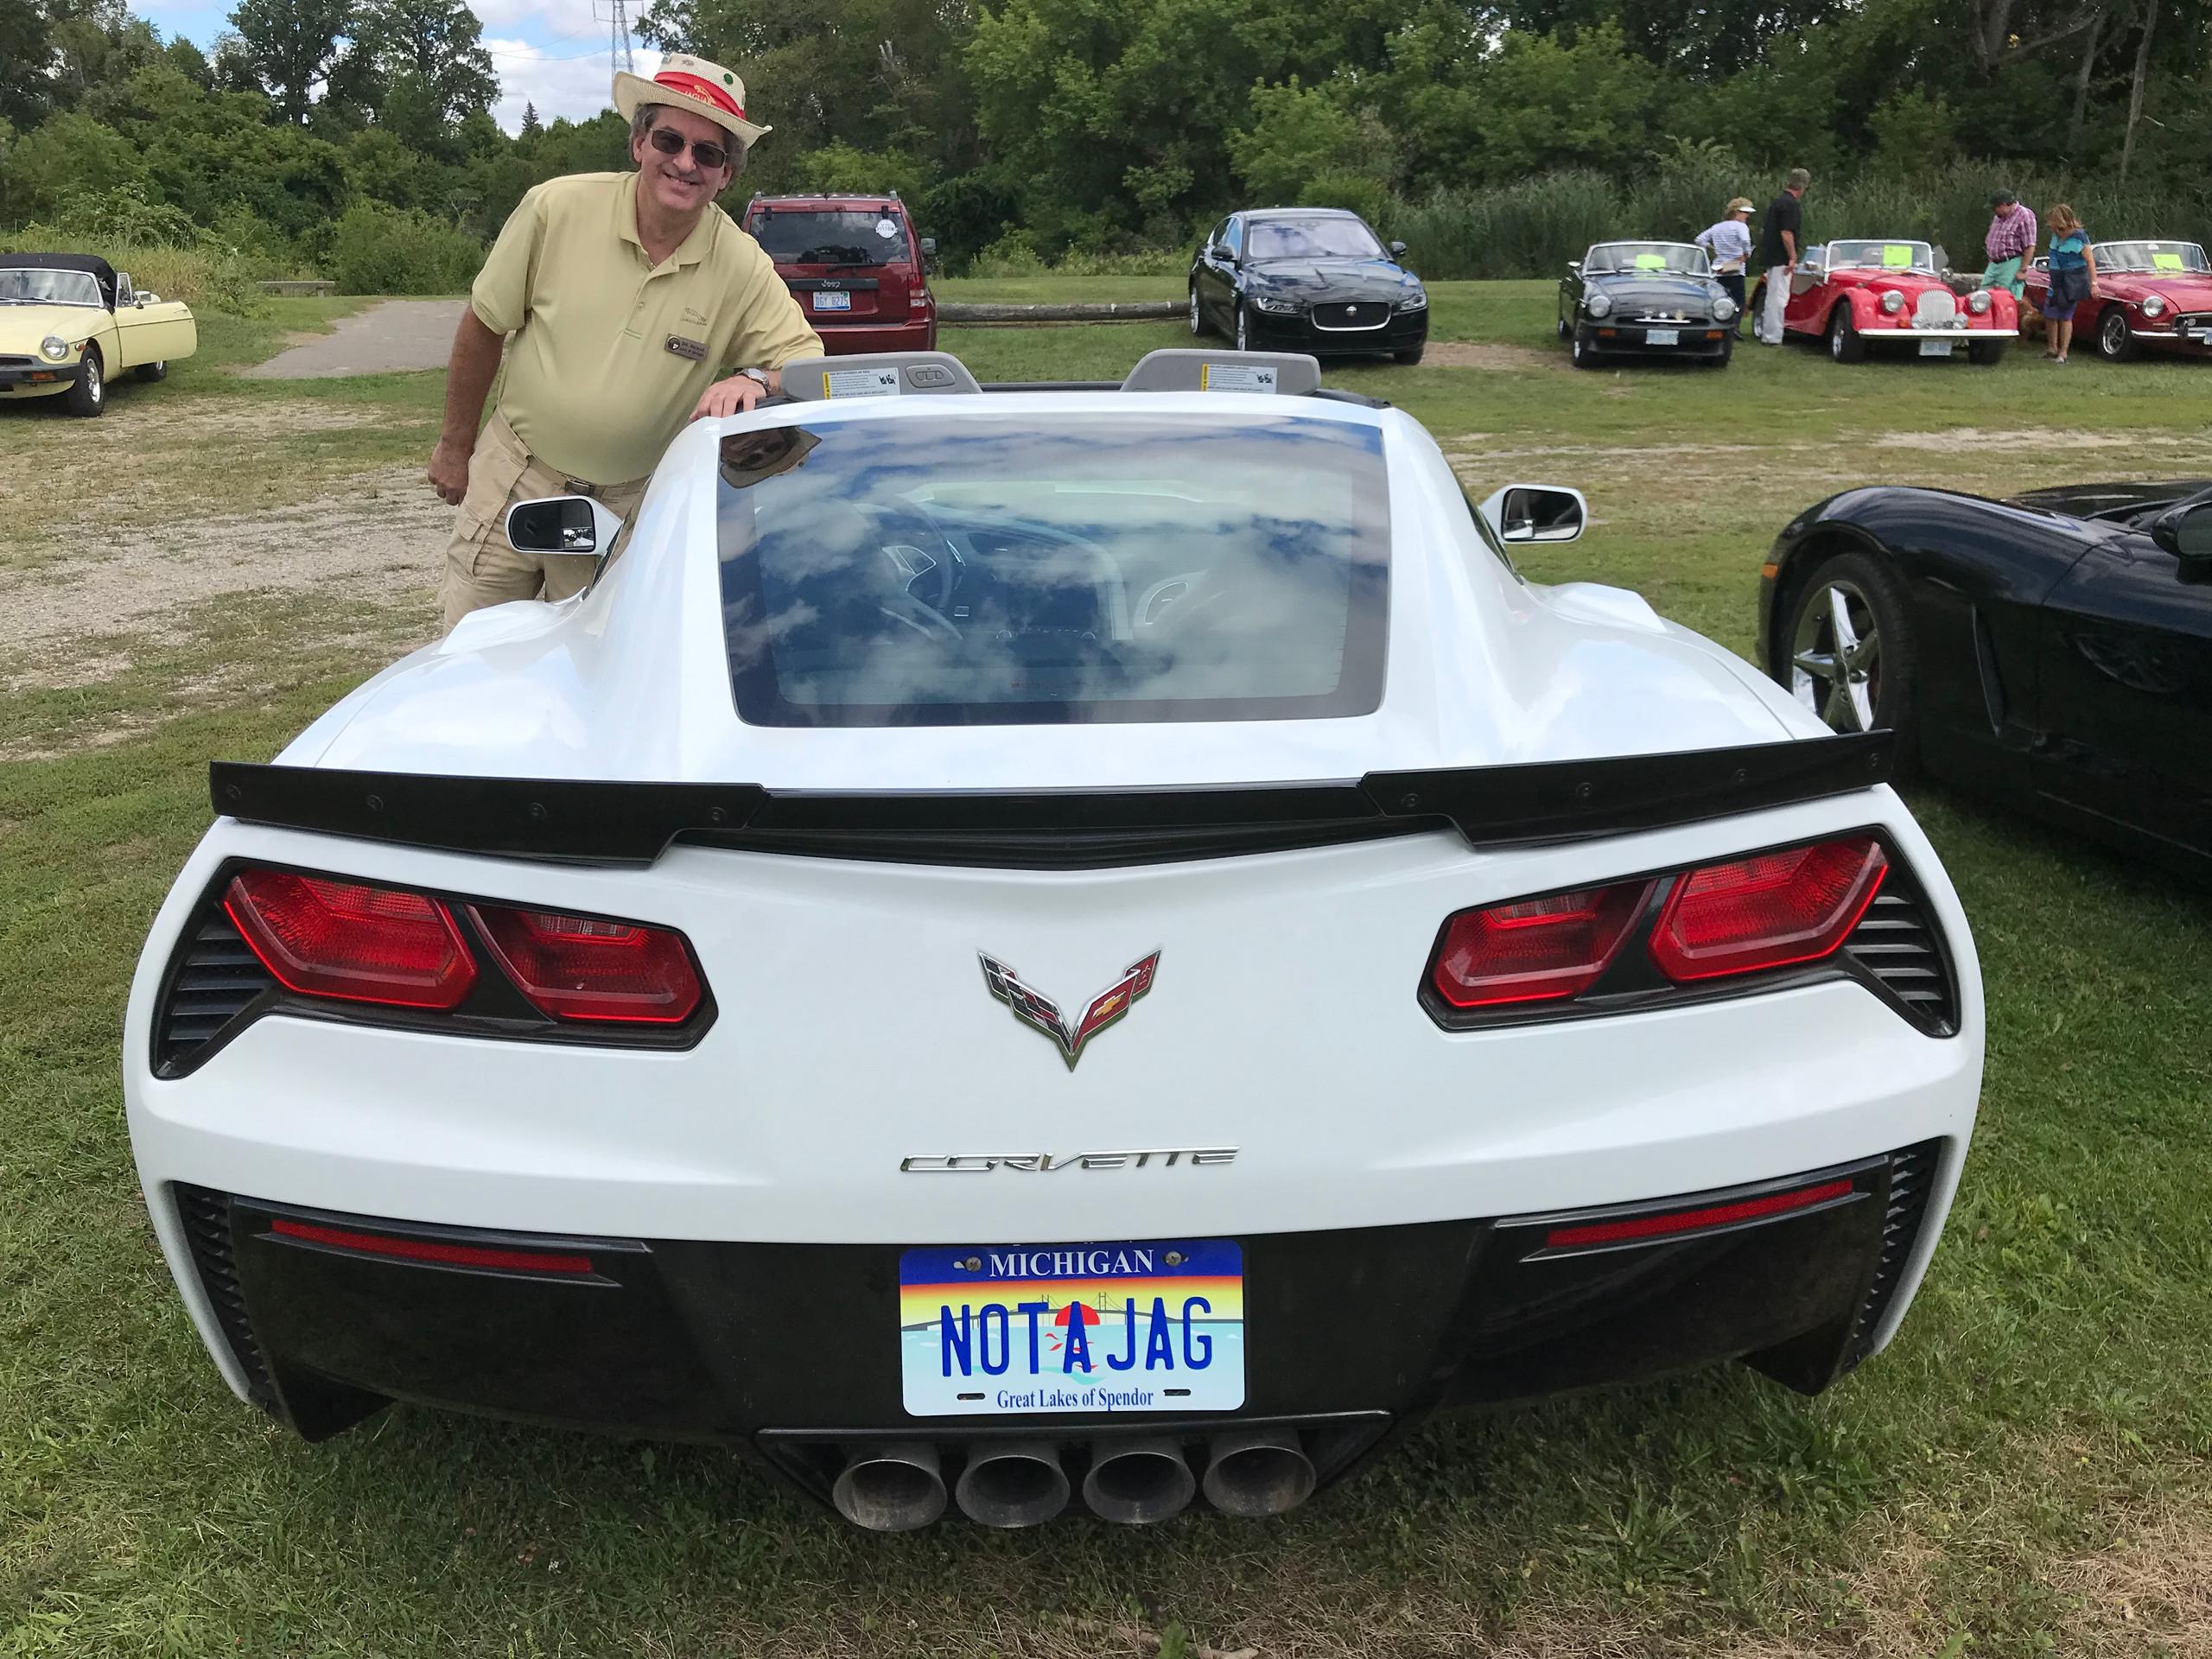 What! Not a Jaguar?